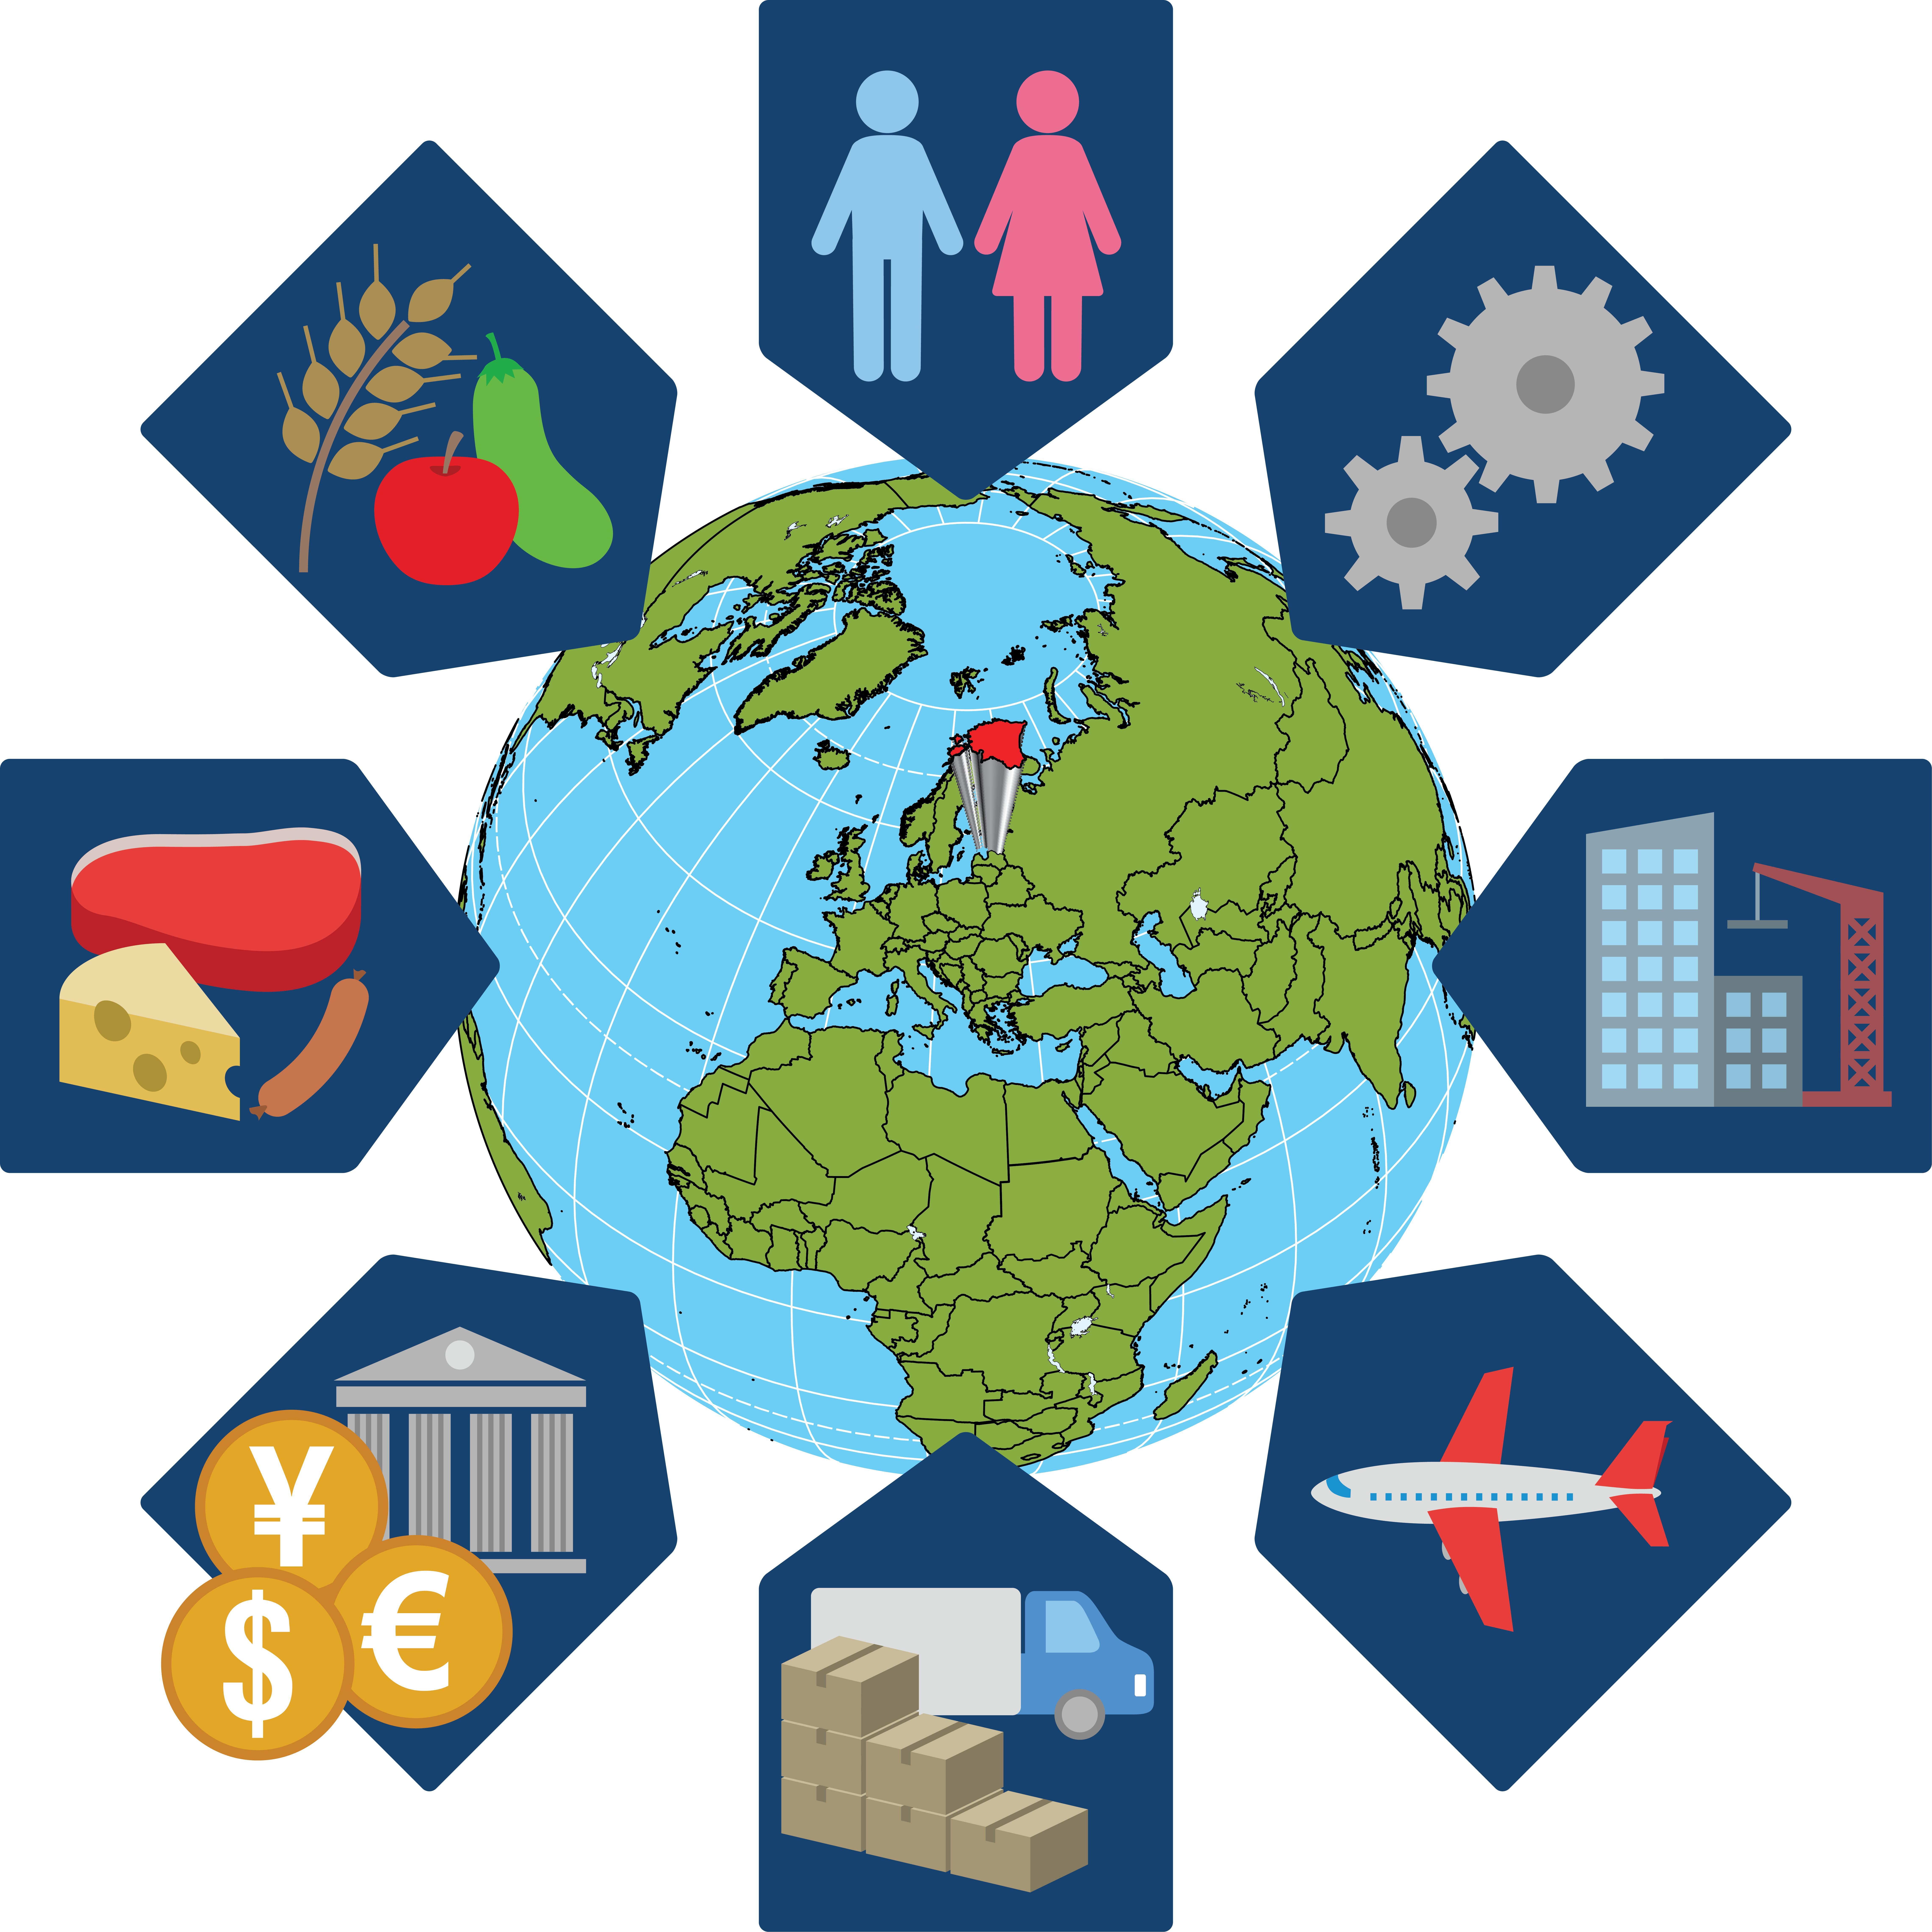 Estonia: Gross Domestic Product